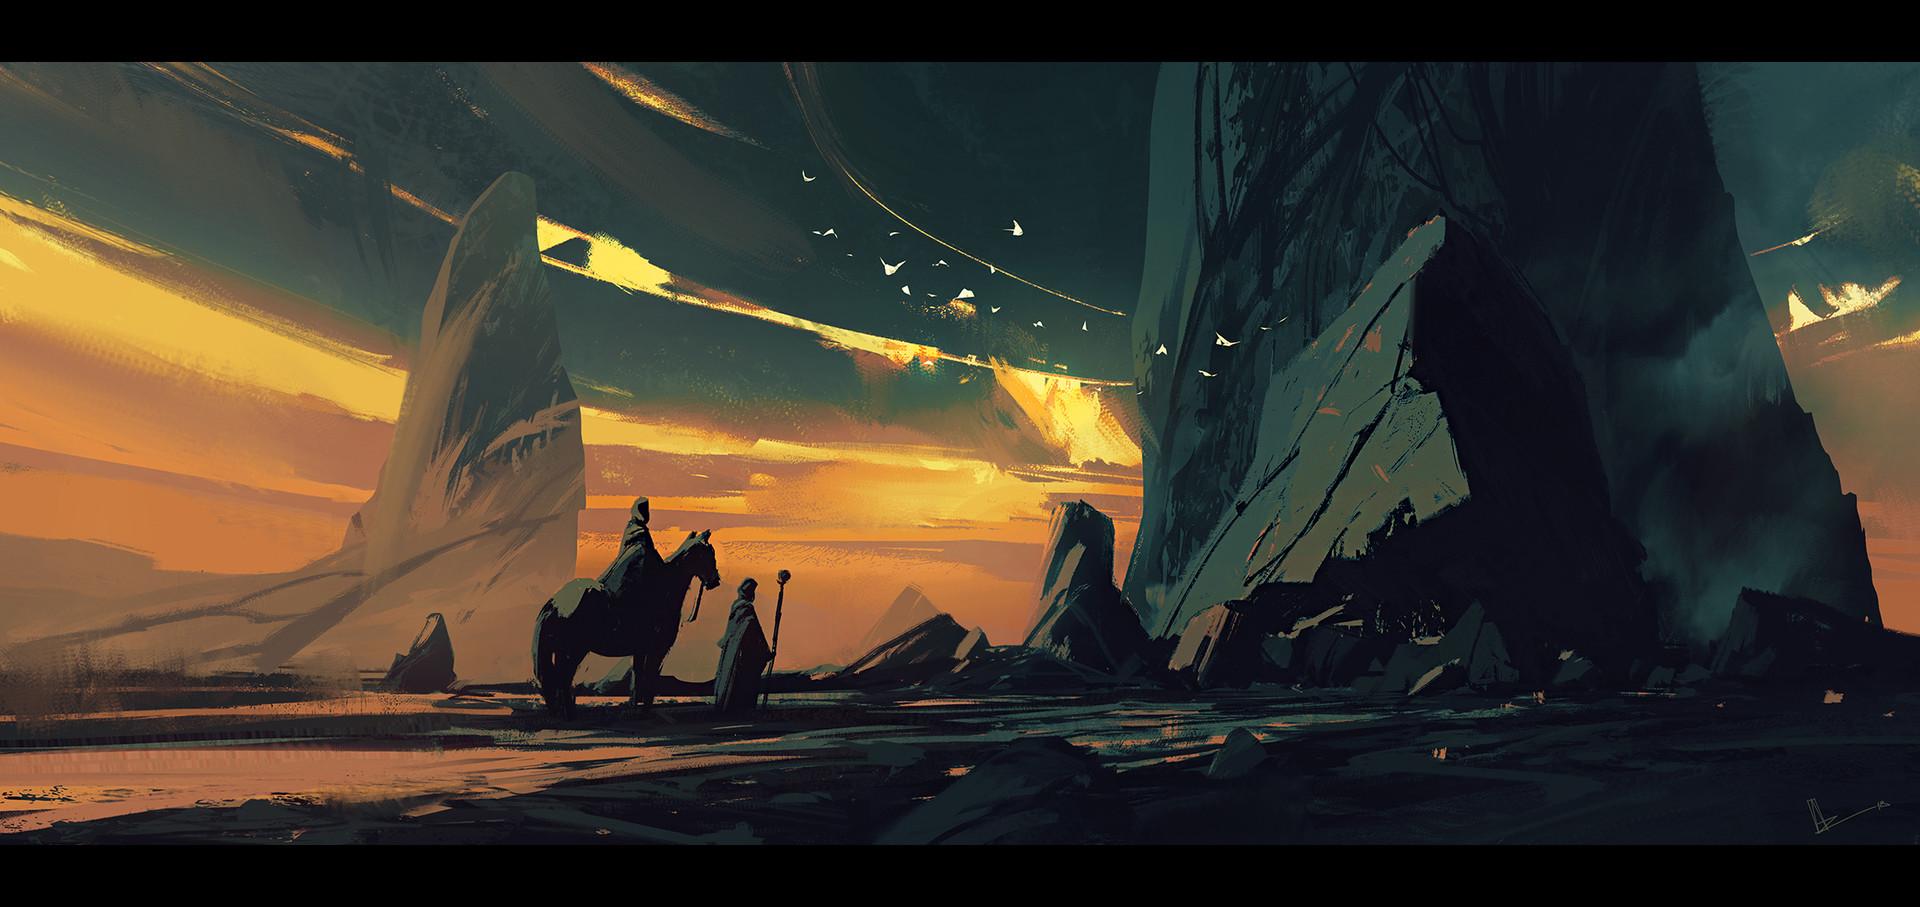 General 1920x907 artwork digital art desert rocks